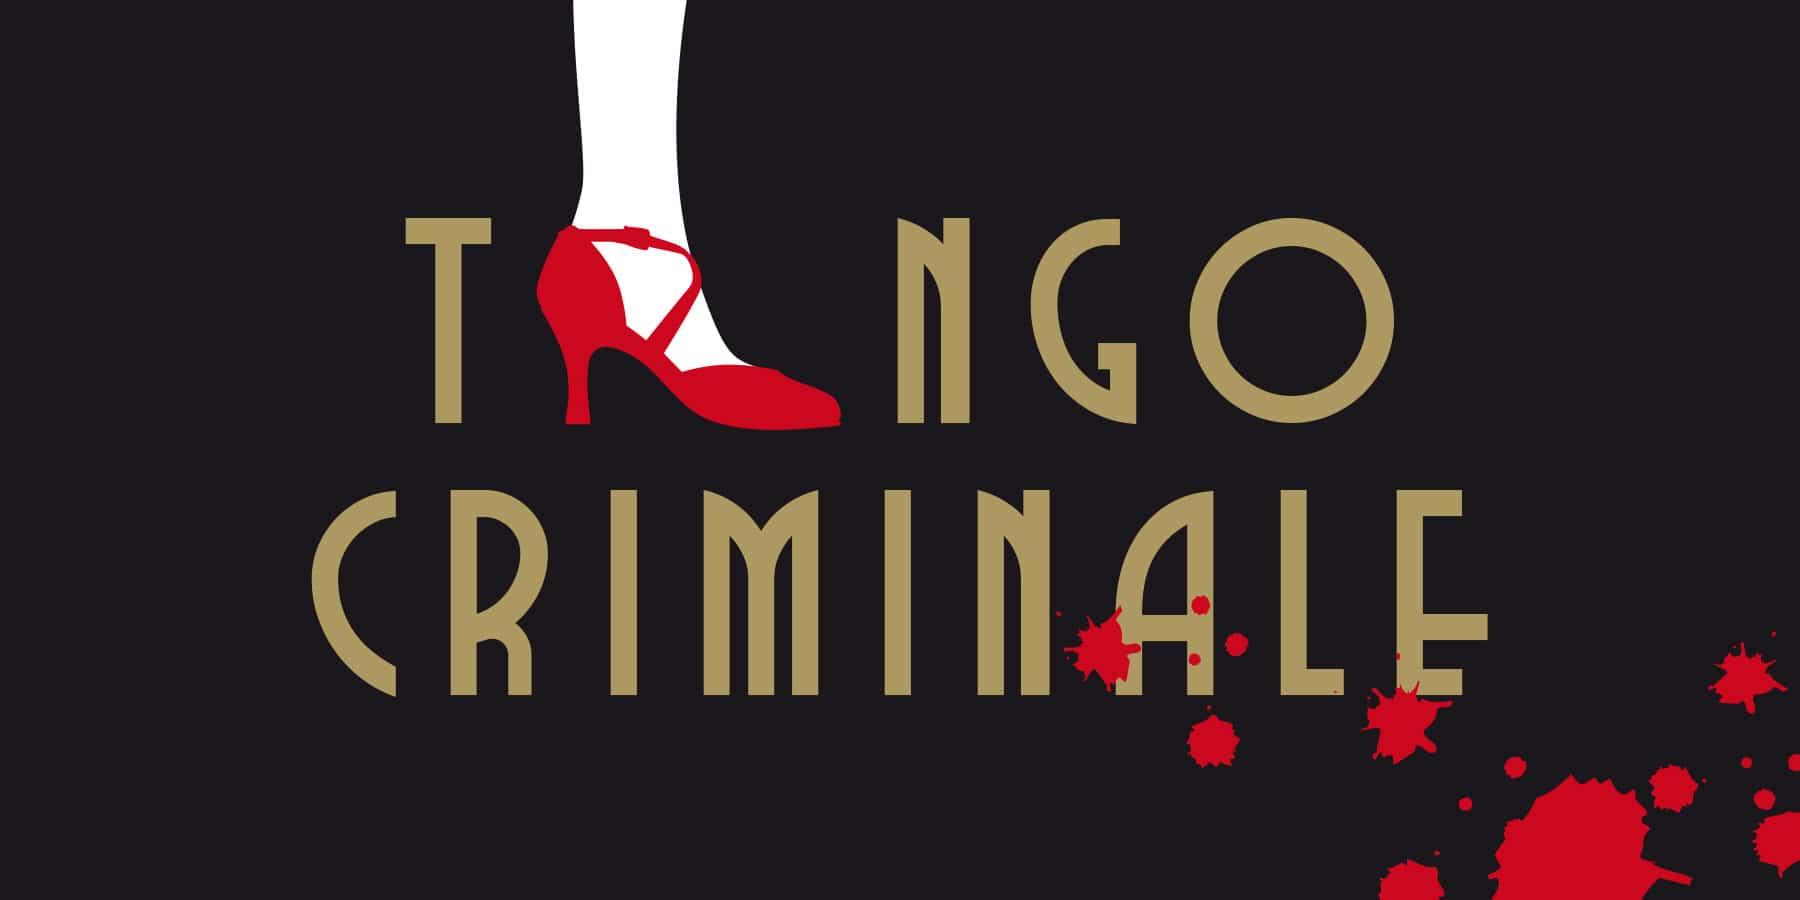 Criminale 2011 – Tango Criminale